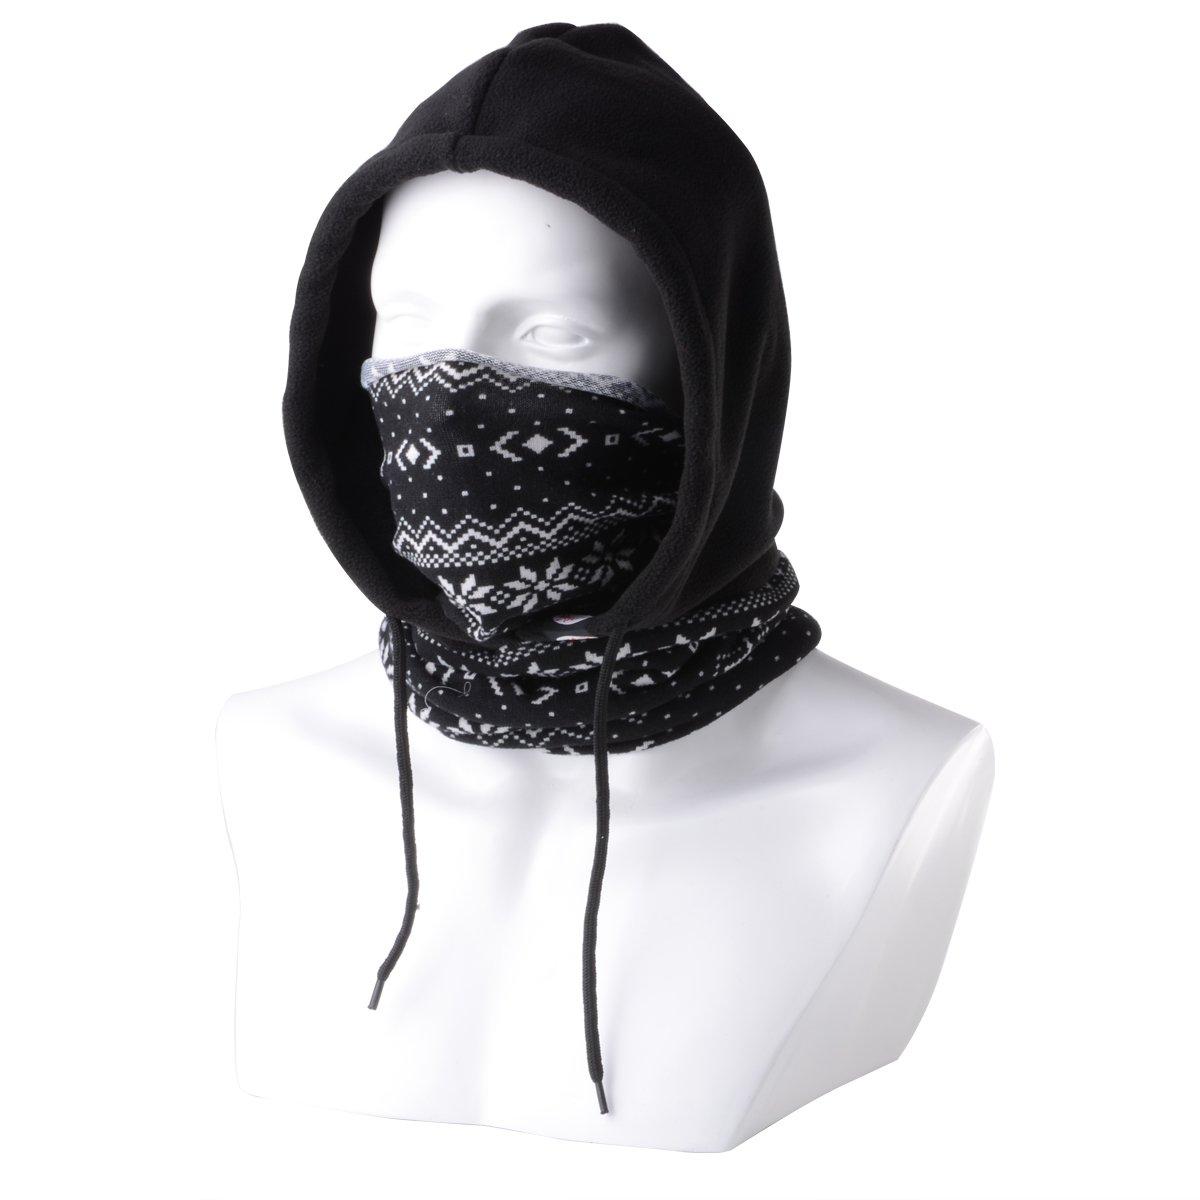 Xcellent Global 4 in 1 Multi-function Balaclavas Winter Neck Warmer Polar  Fleece Hat Cap Face Mask Outdoor M-SP00 133076781